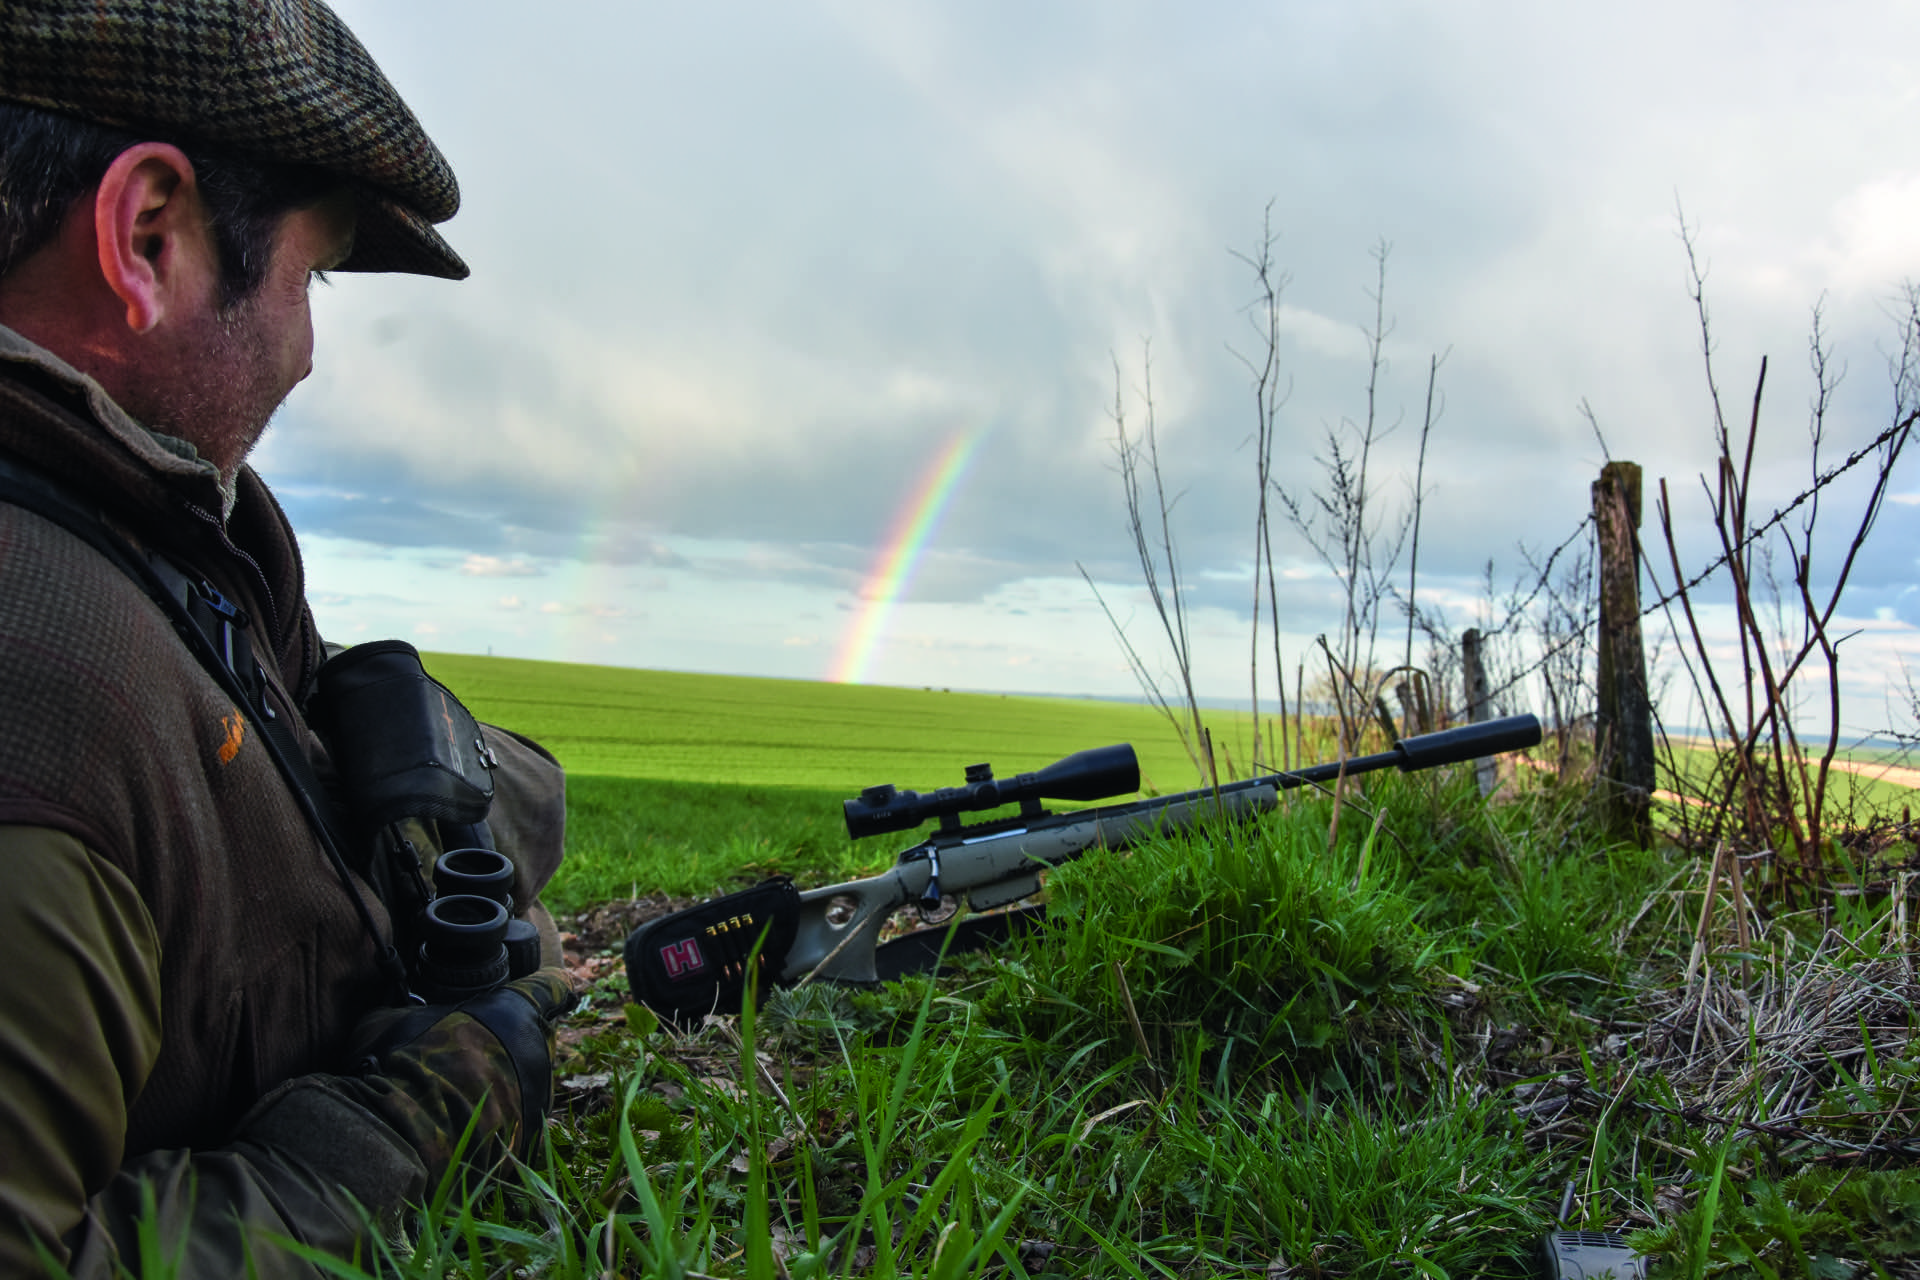 Regenbogen 3 jaegermagazin jagd Mike Robinson jagen Damwild Wildbret